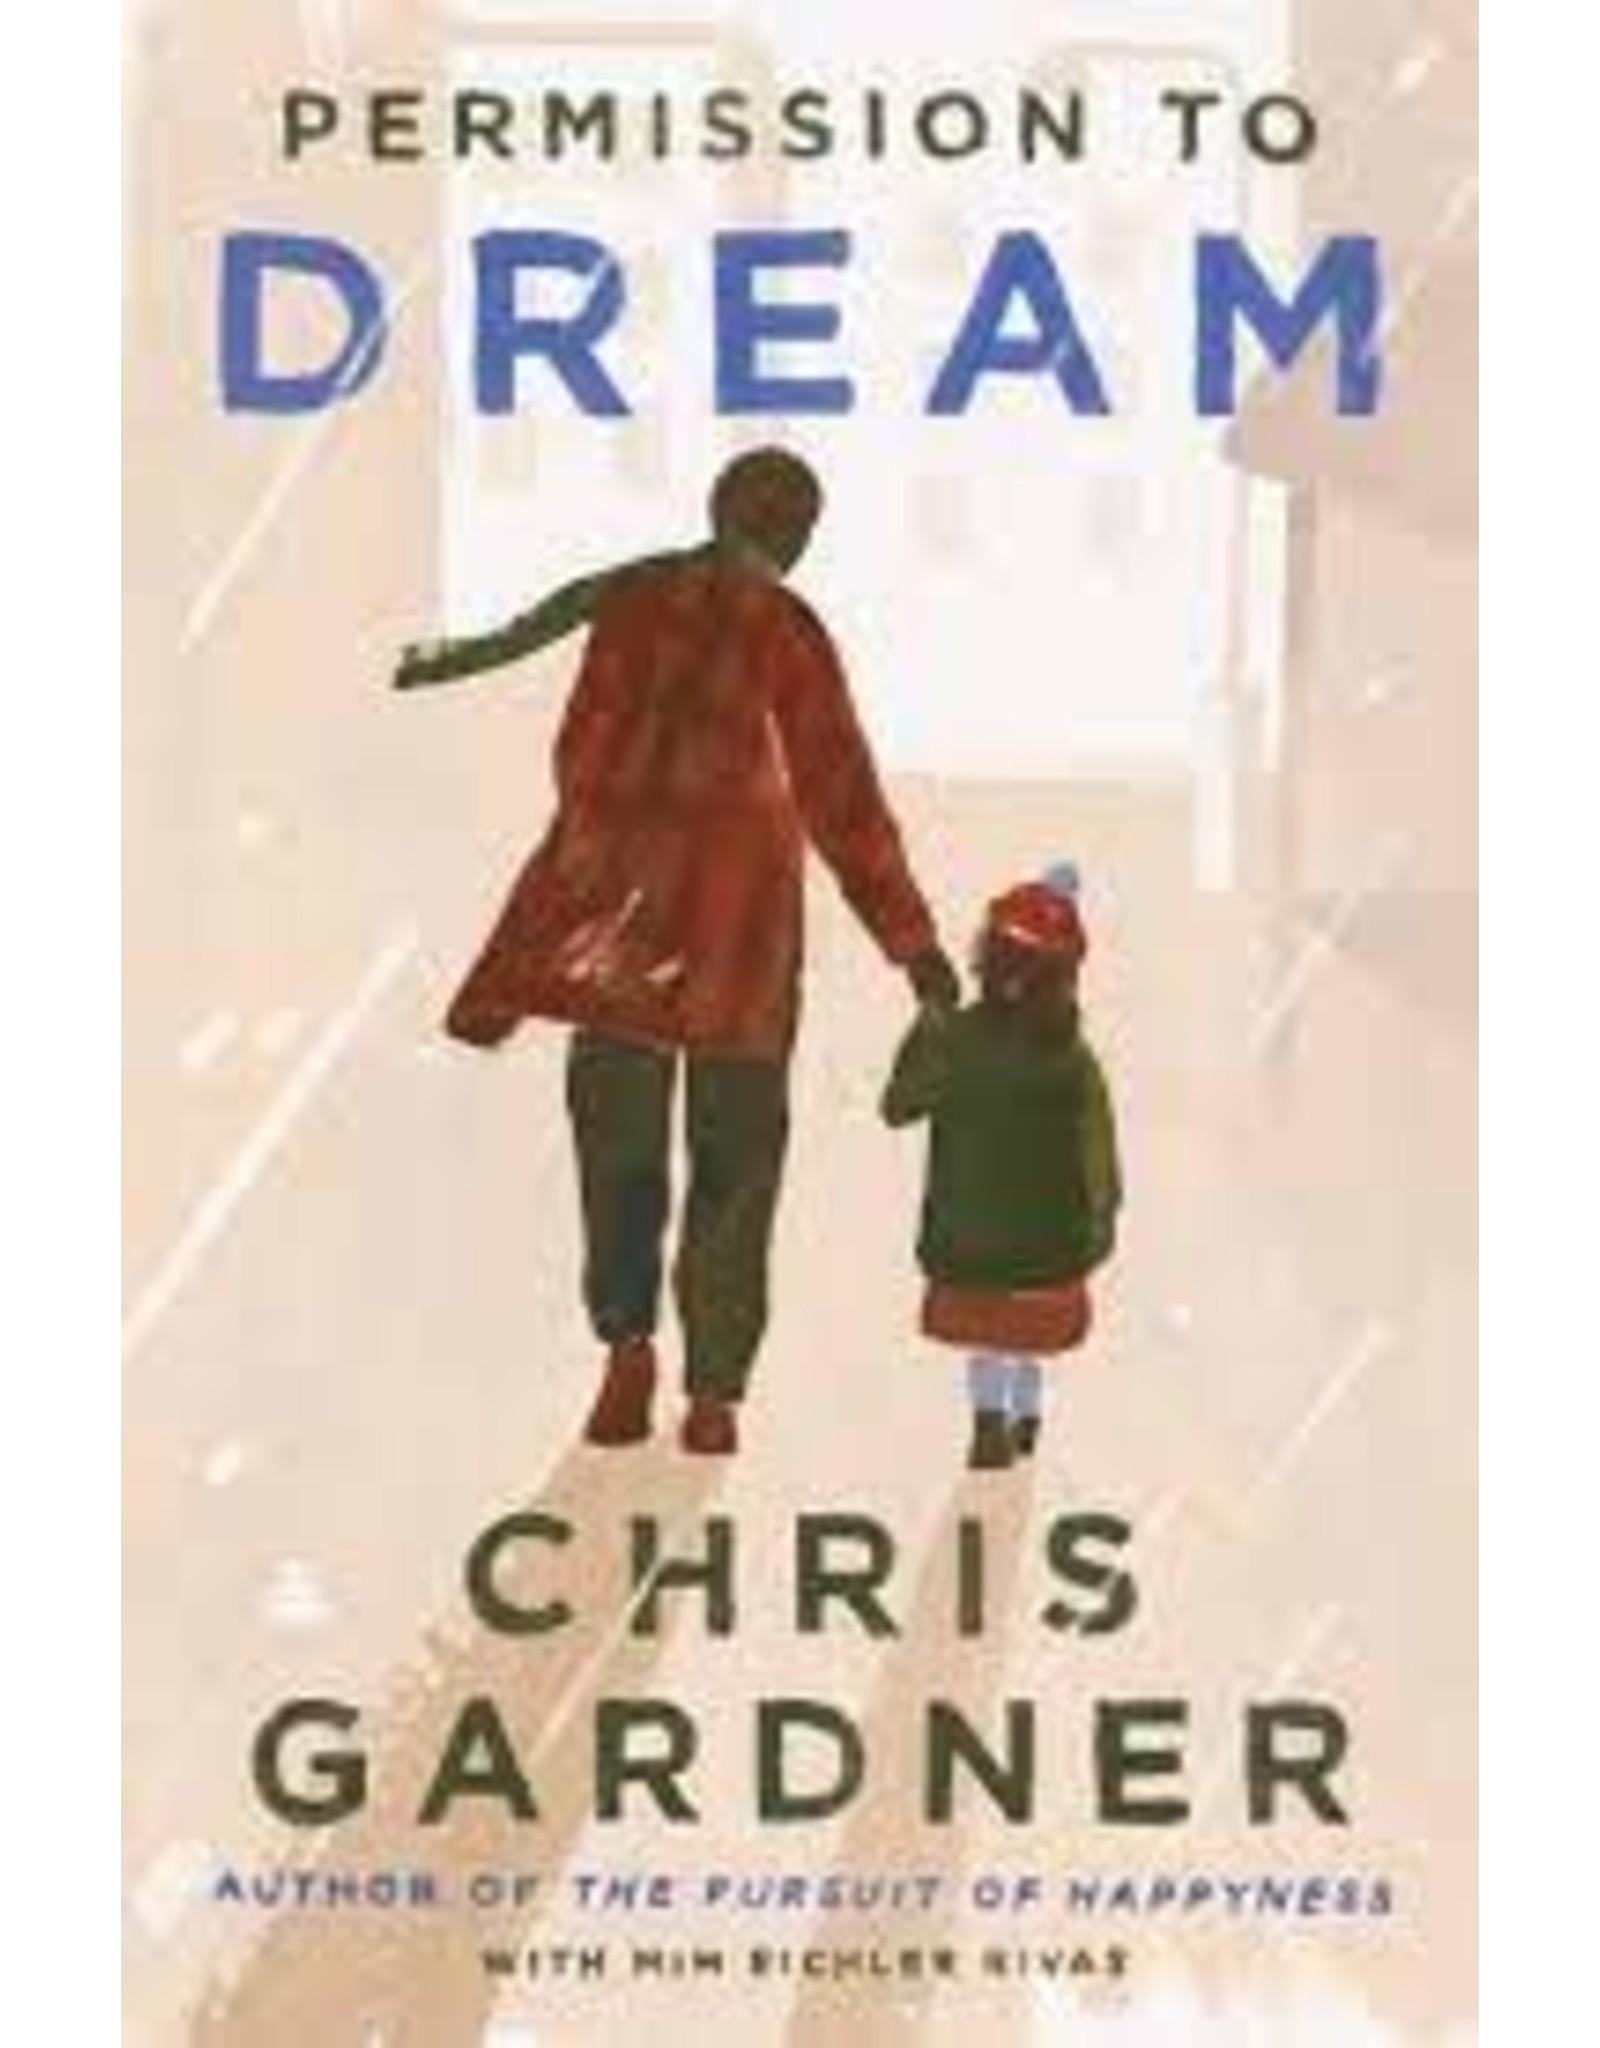 Books Permission to Dream by Chris Gardner with Mim Eichler Rivas